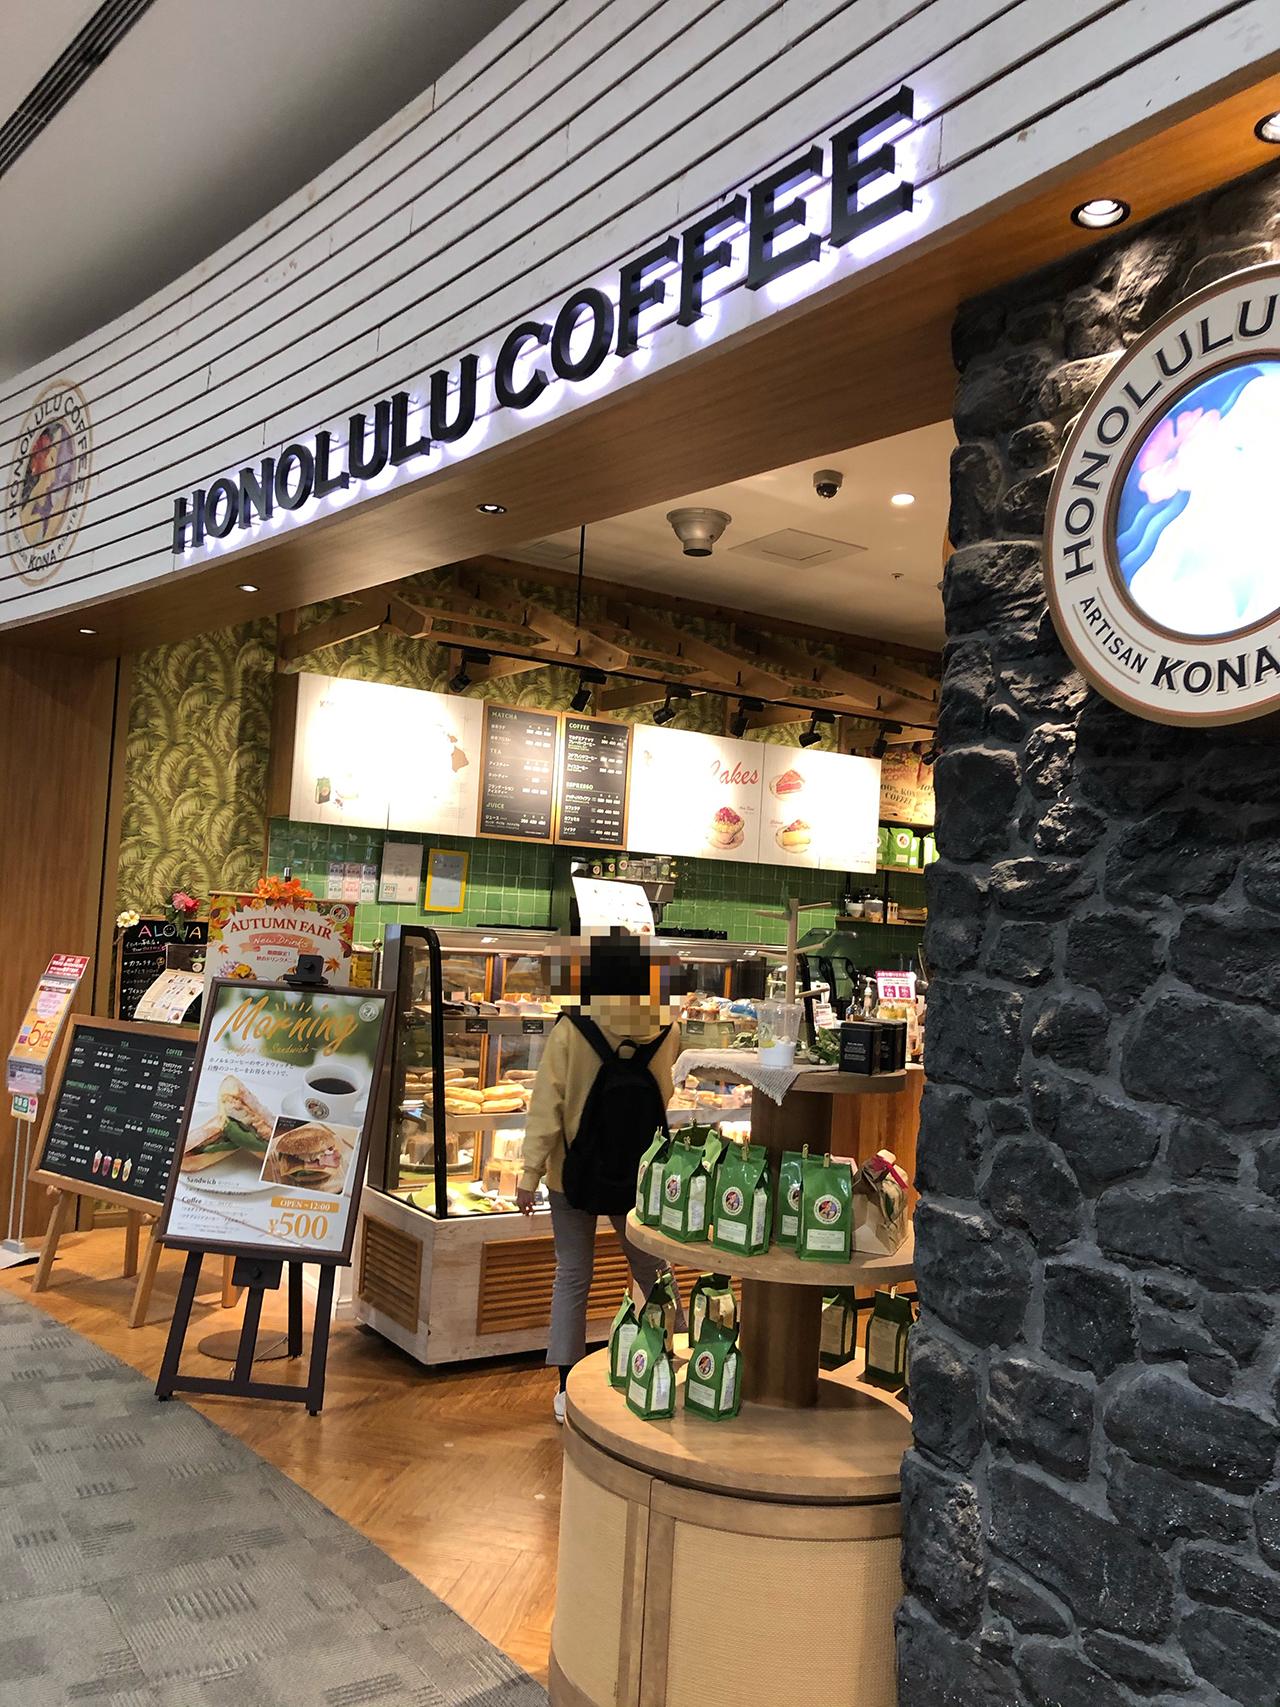 HONOLULU COFFEE(ホノルルコーヒー) イオンモール幕張新都心店の画像